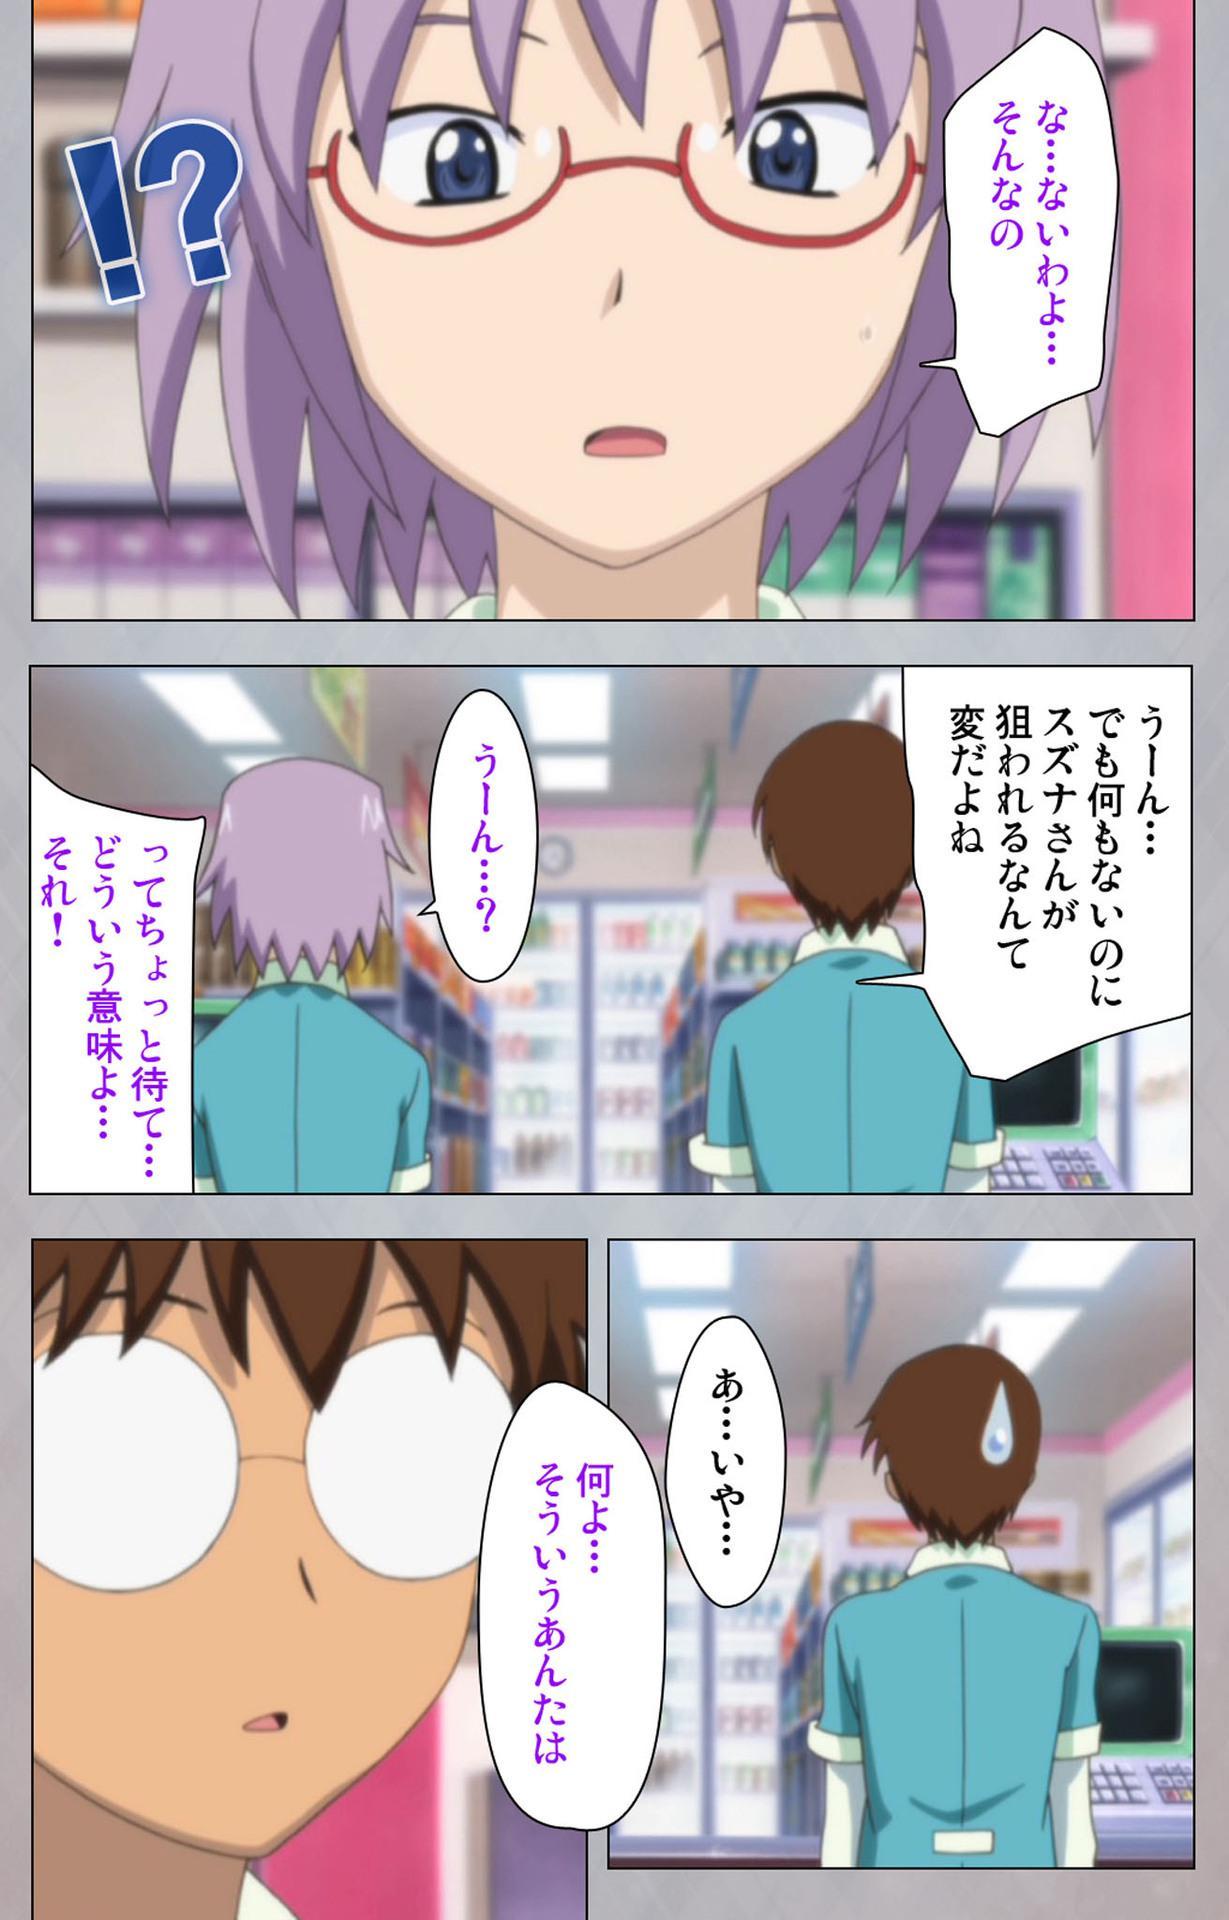 [Digital Works] [Full Color Seijin Ban] Sex Android ~Risou no Onna de Nuite yaru~ Kanzenban 59